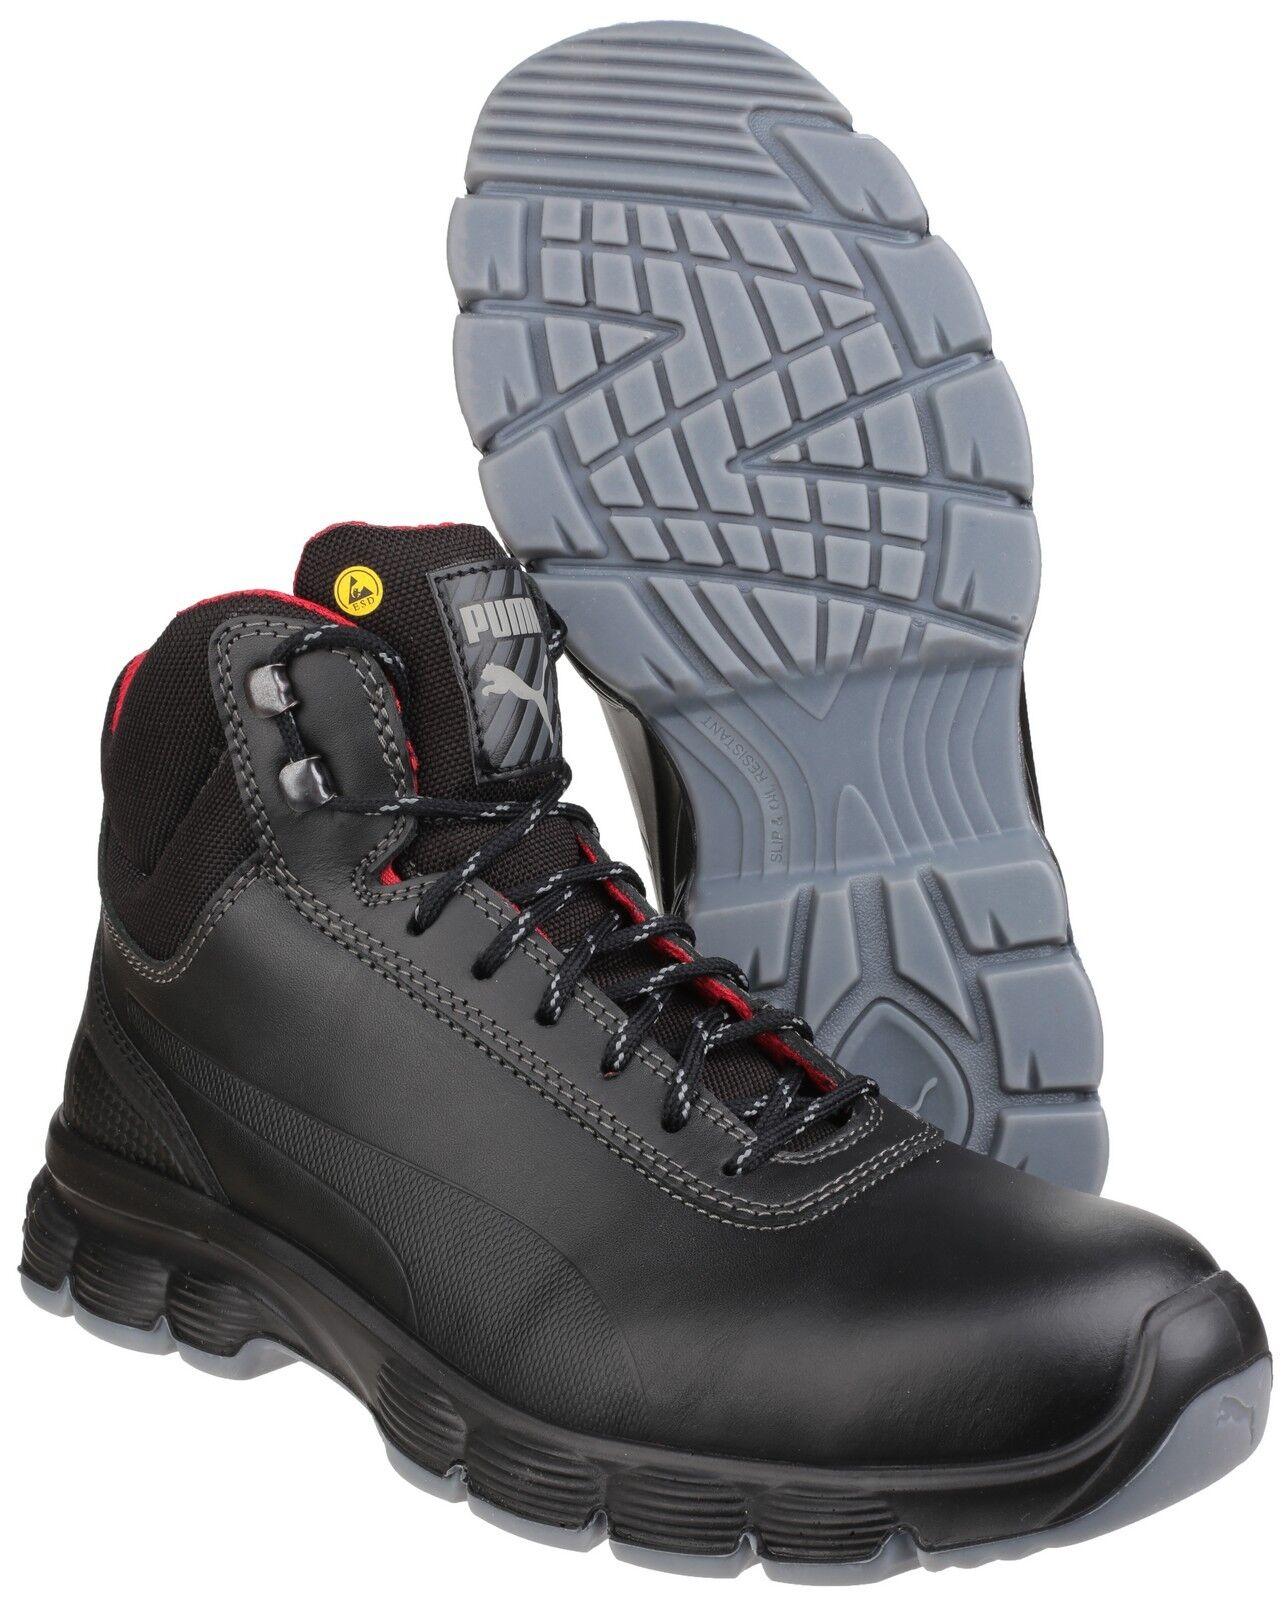 Puma Pioneer Mid Safety Steel Toe Cap Mens Water Resistant Work Boots UK6-12